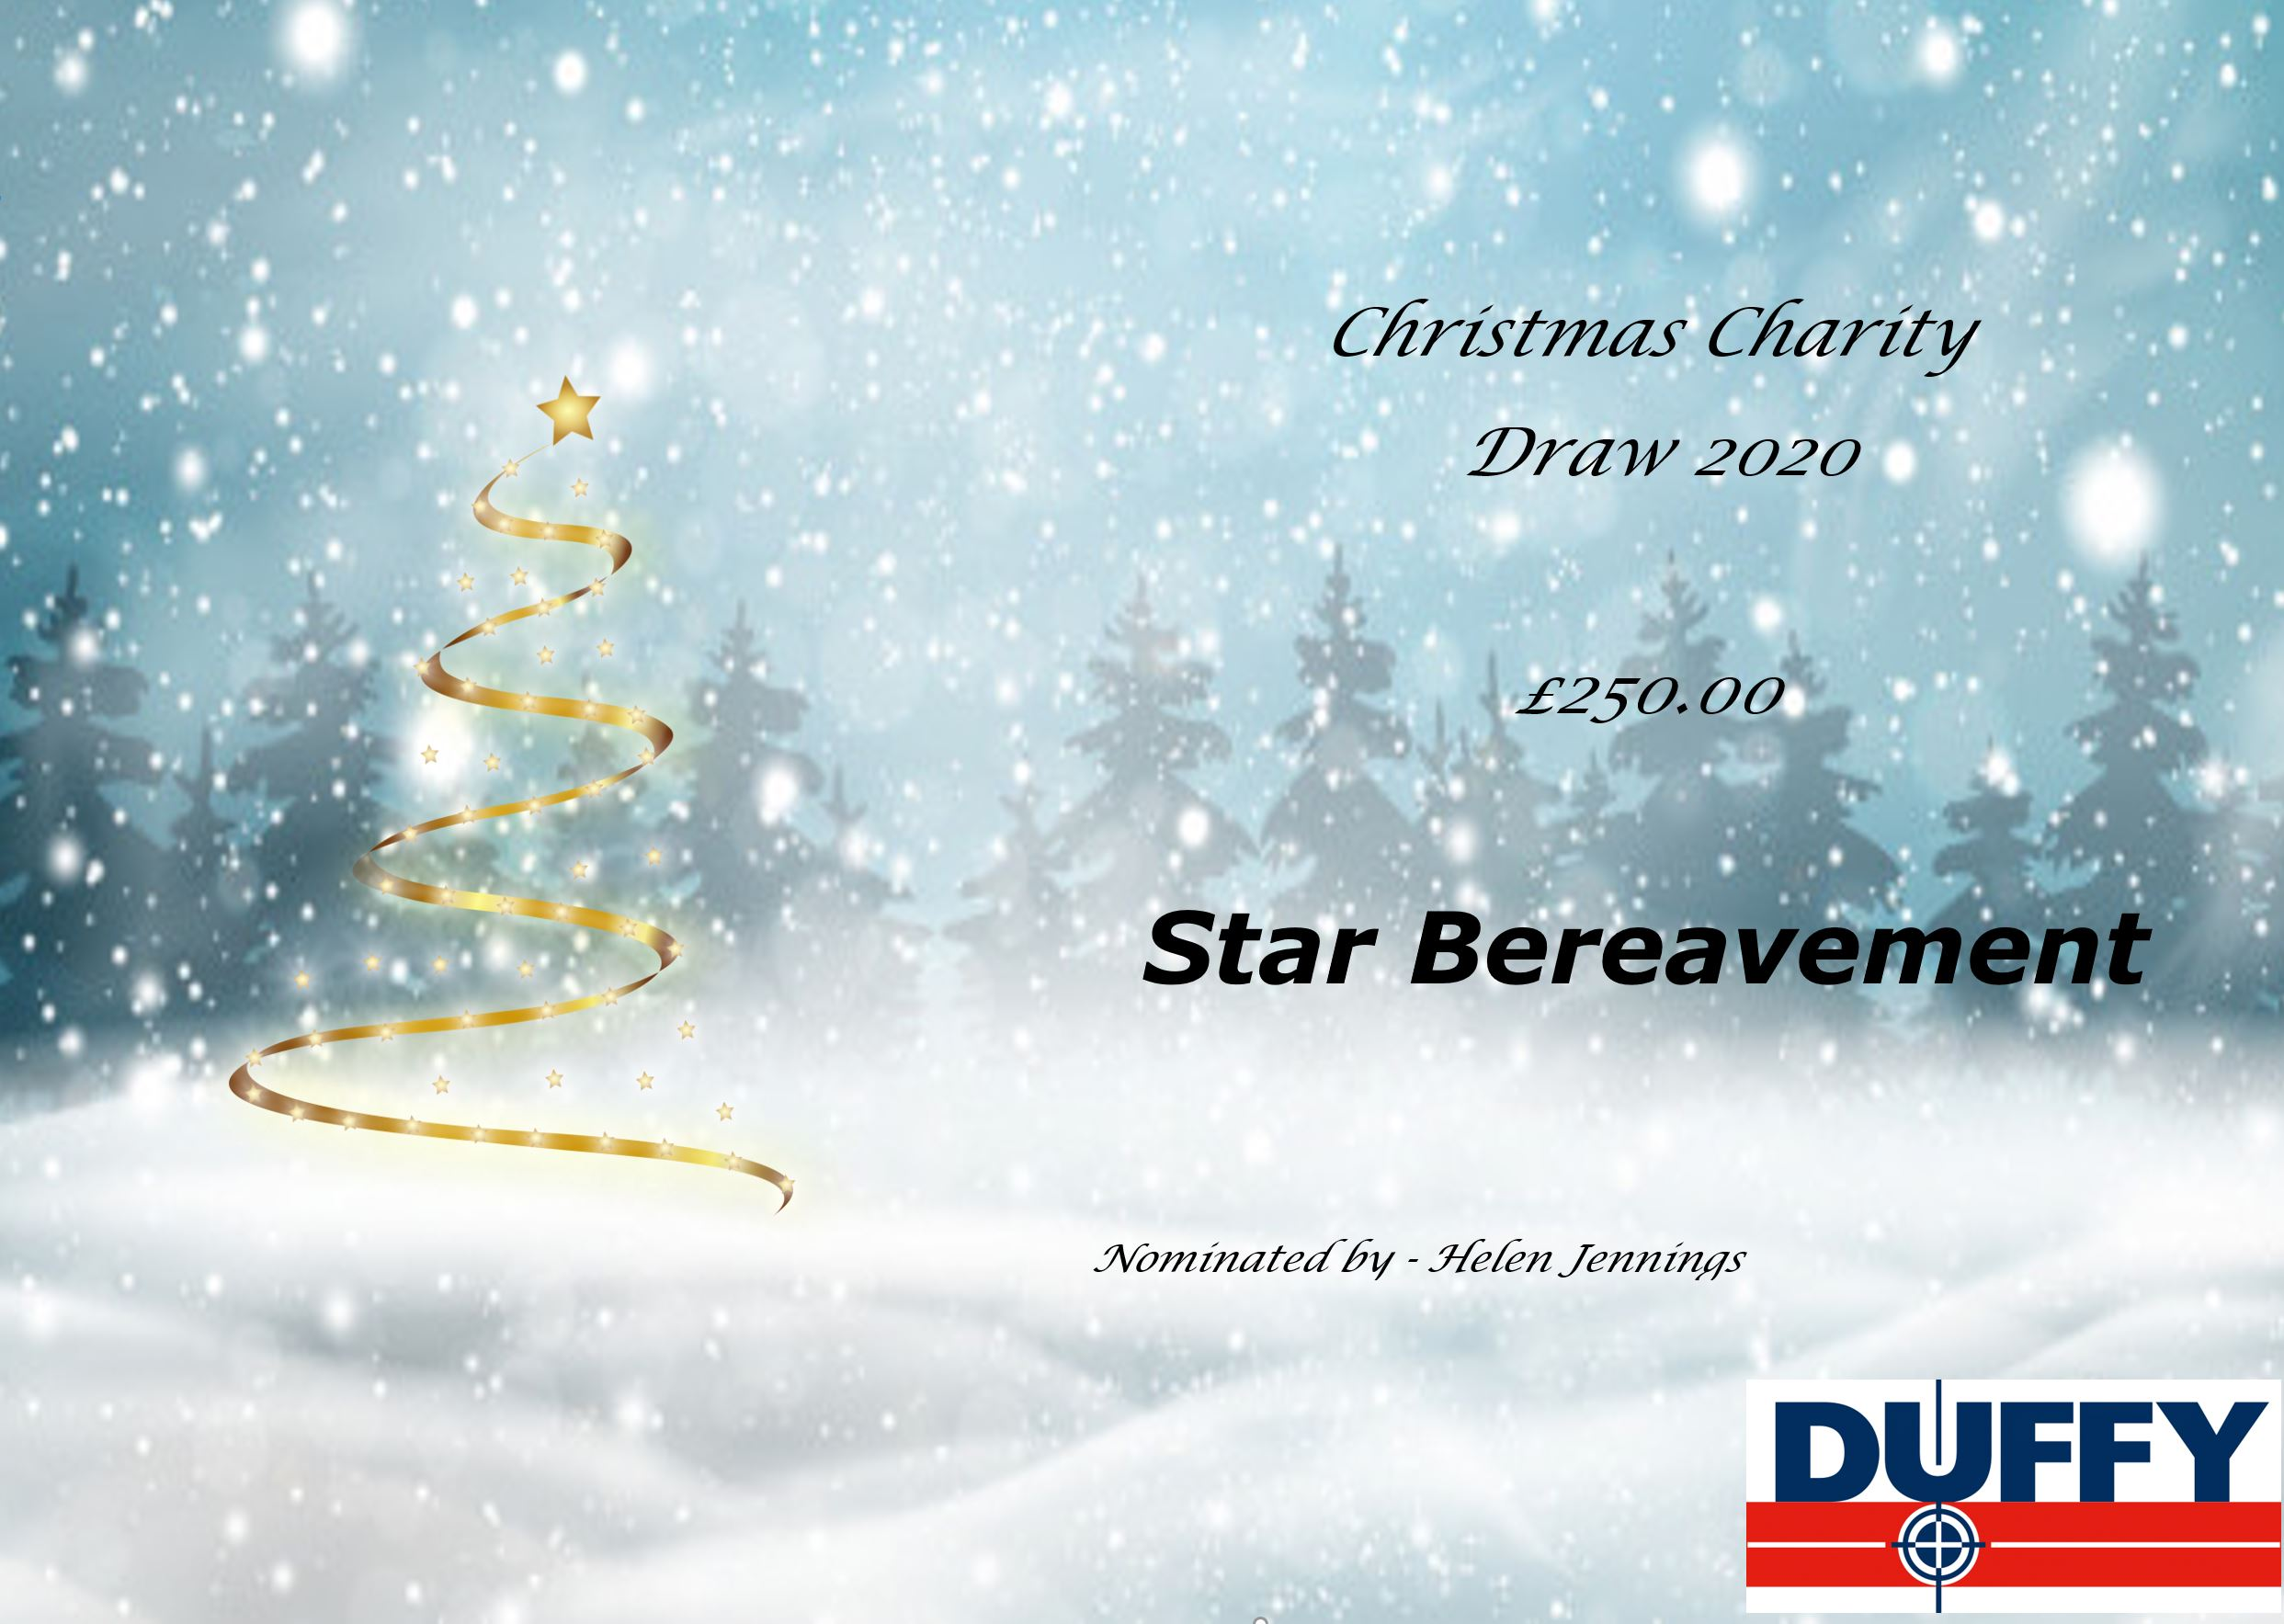 Star Bereavement